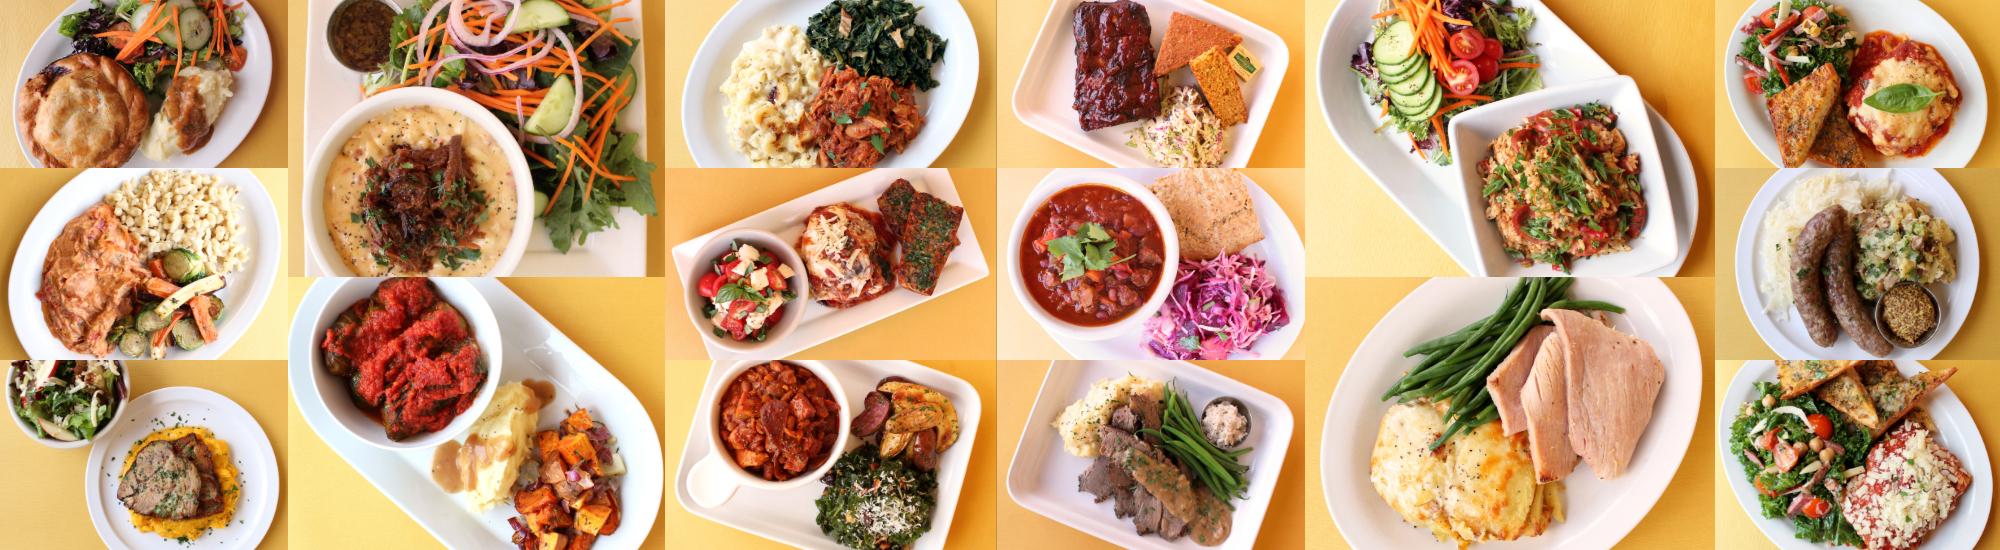 Zingerman's Deli Dinners A Go-Go plates